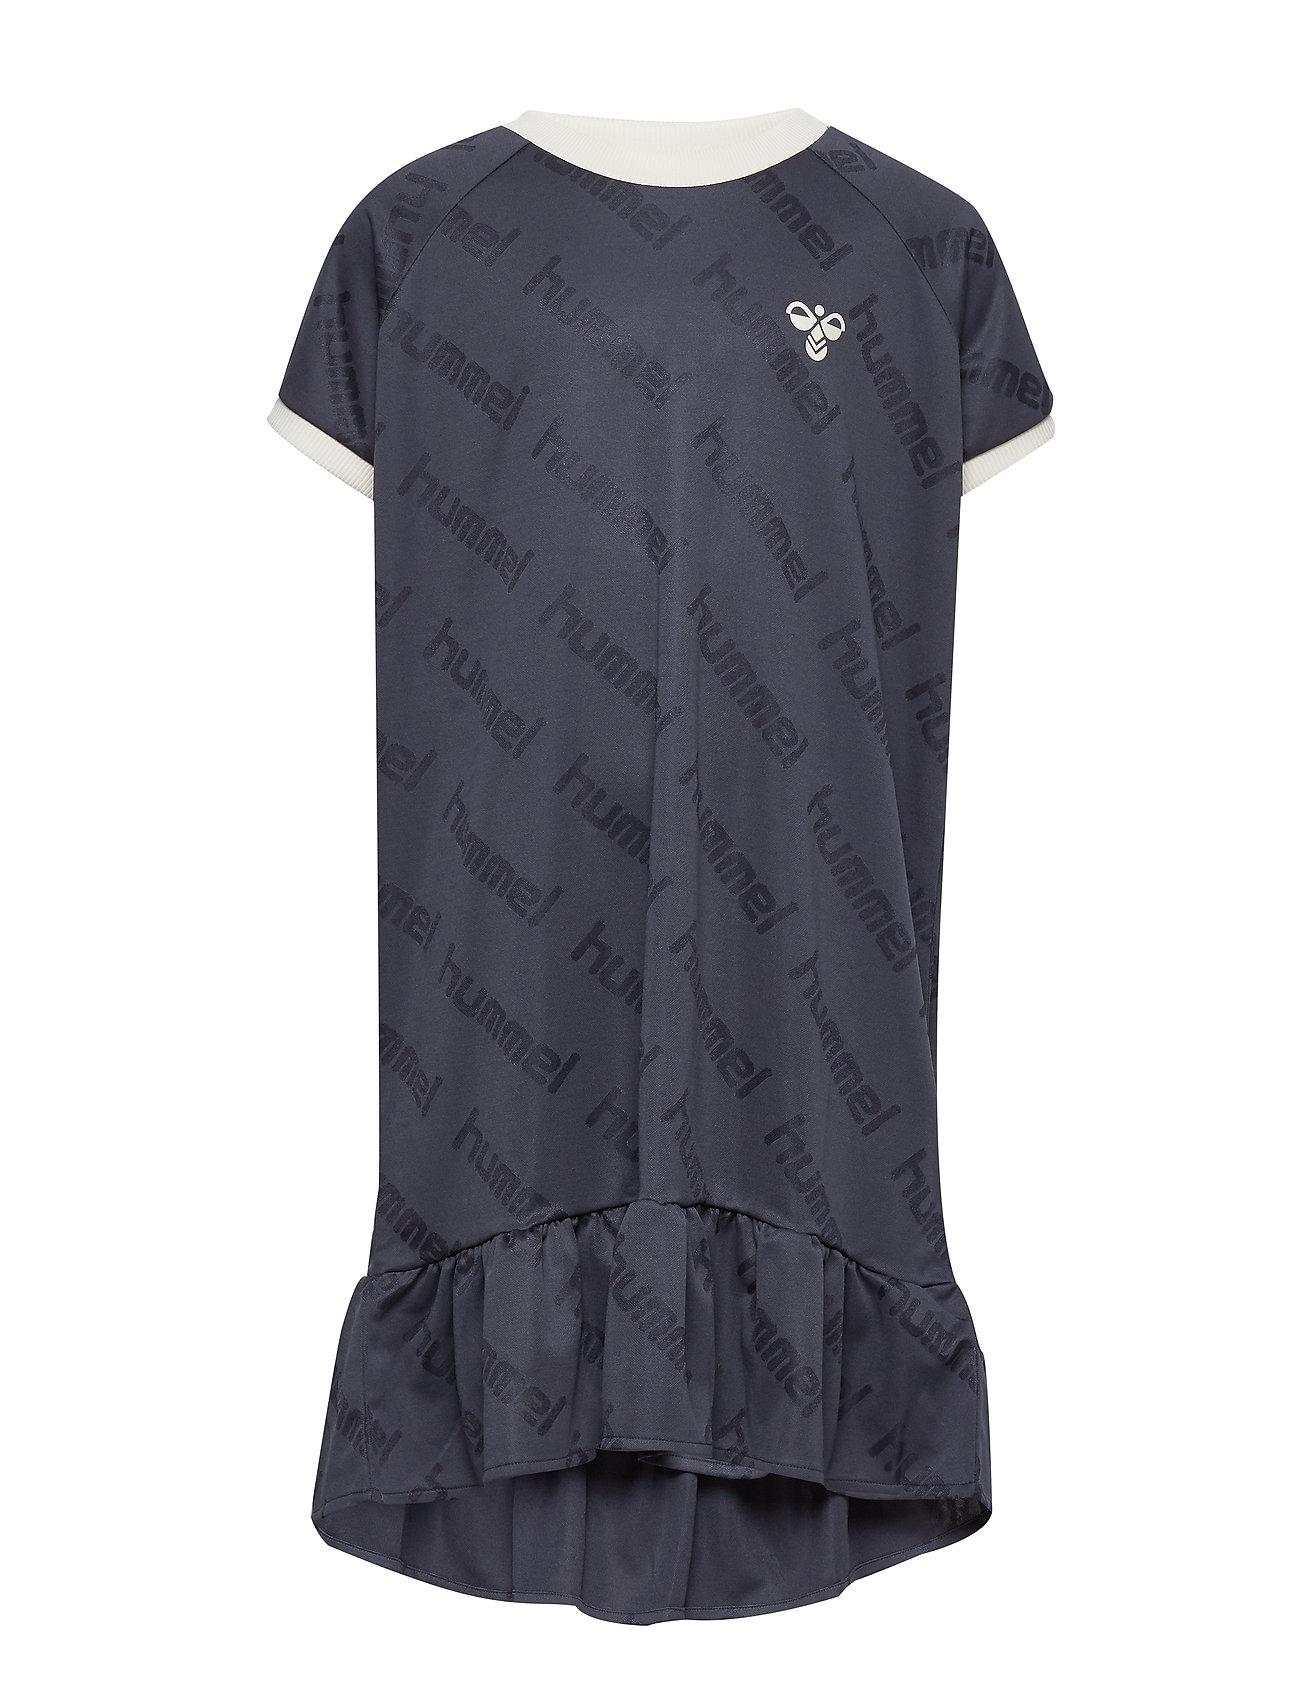 Image of Hmlsara Dress S/S Kjole Blå Hummel (3344406461)